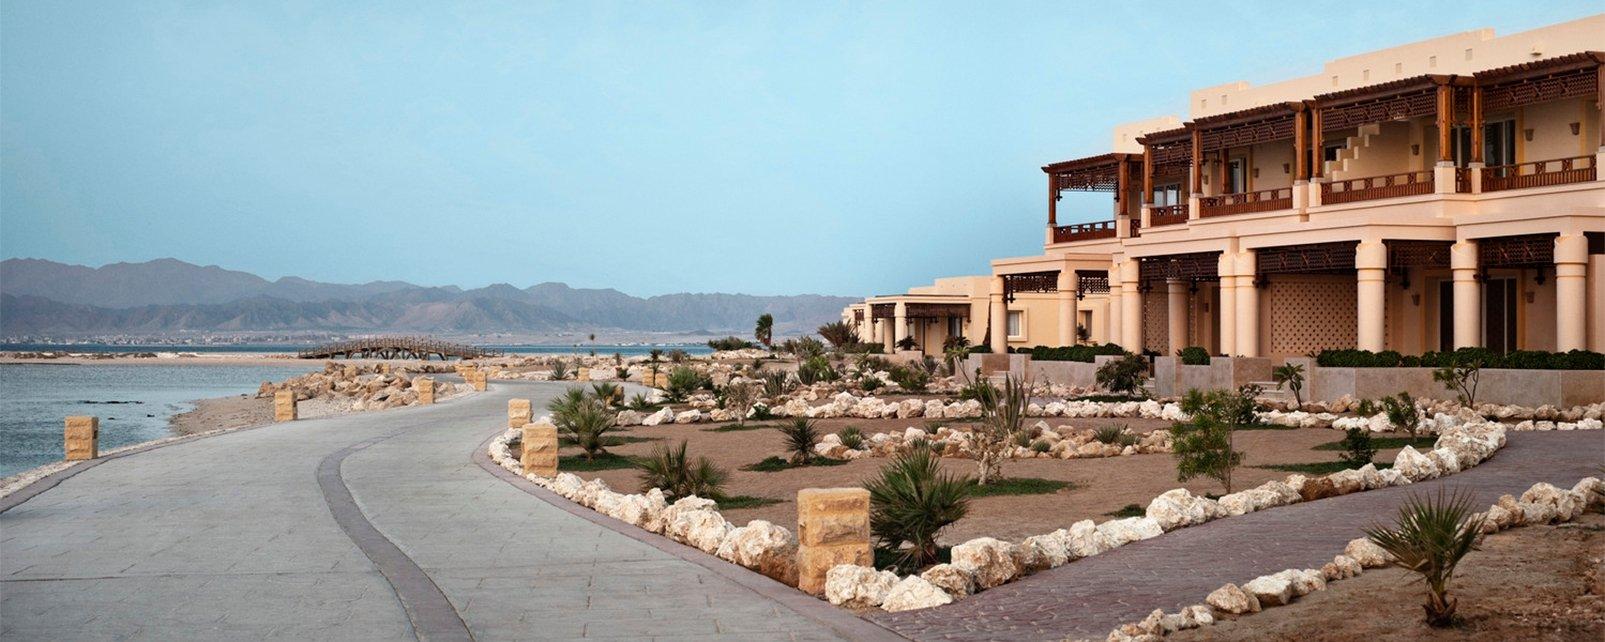 Hôtel Sheraton Soma Bay Resort